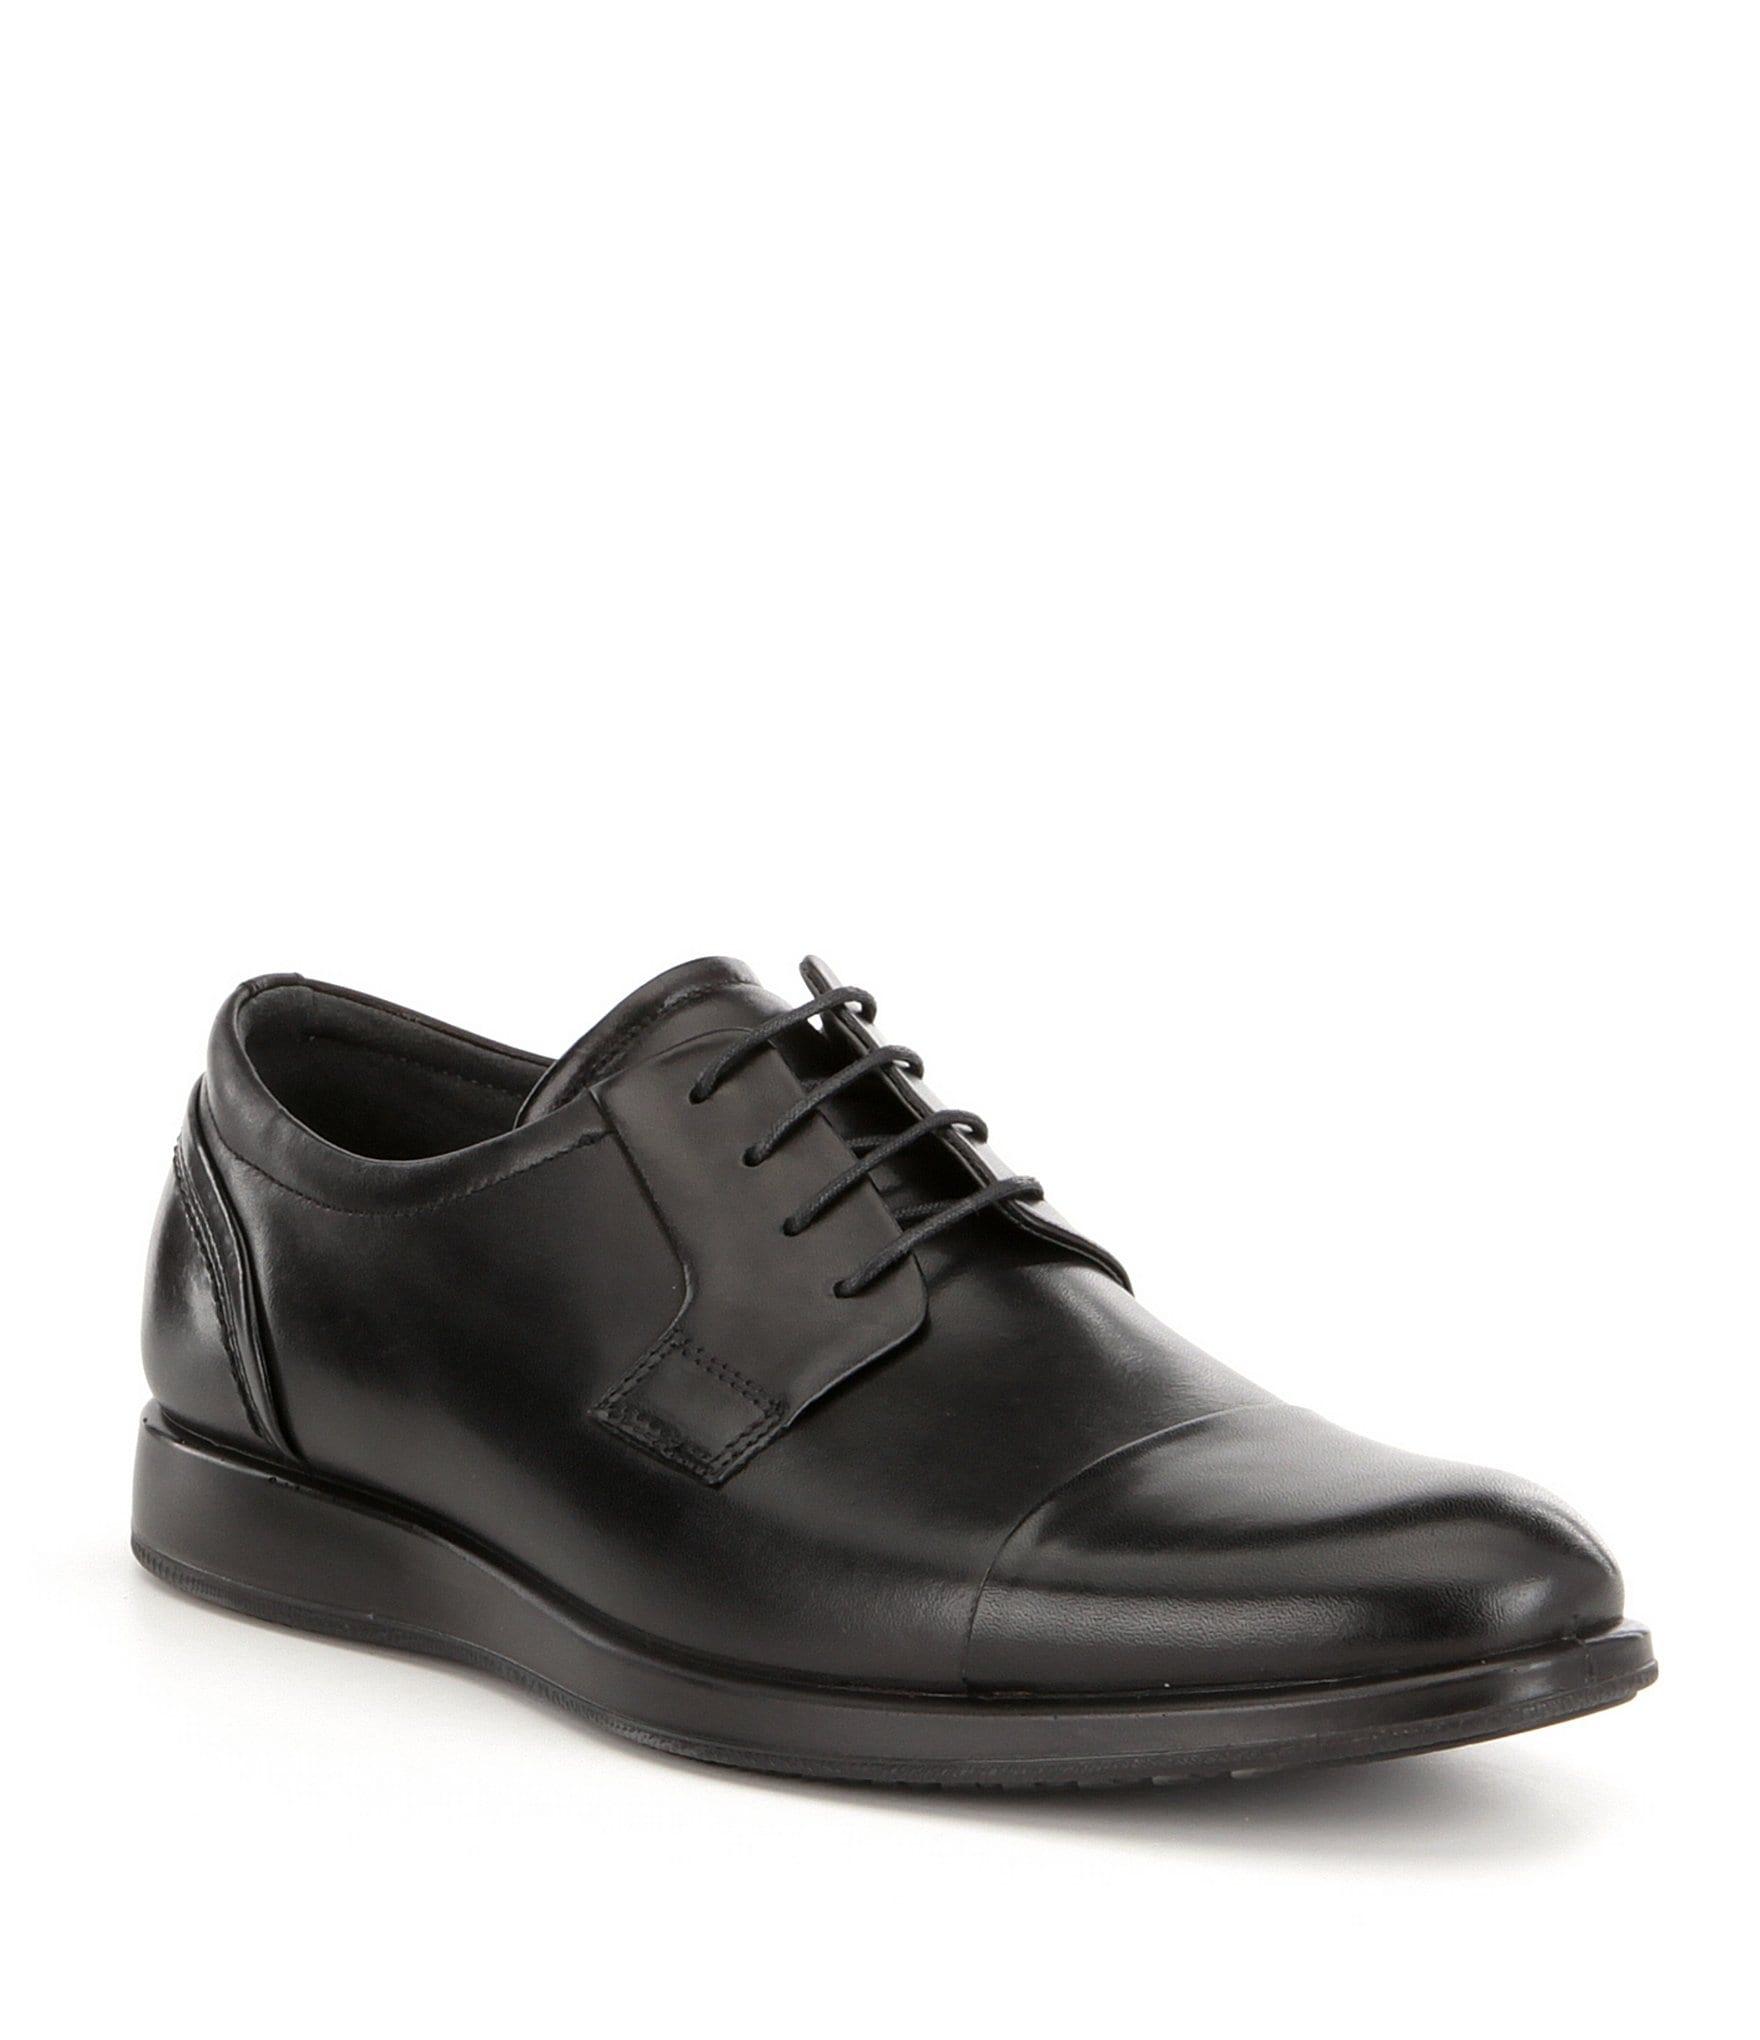 ecco 180 s jared cap toe dress shoes dillards